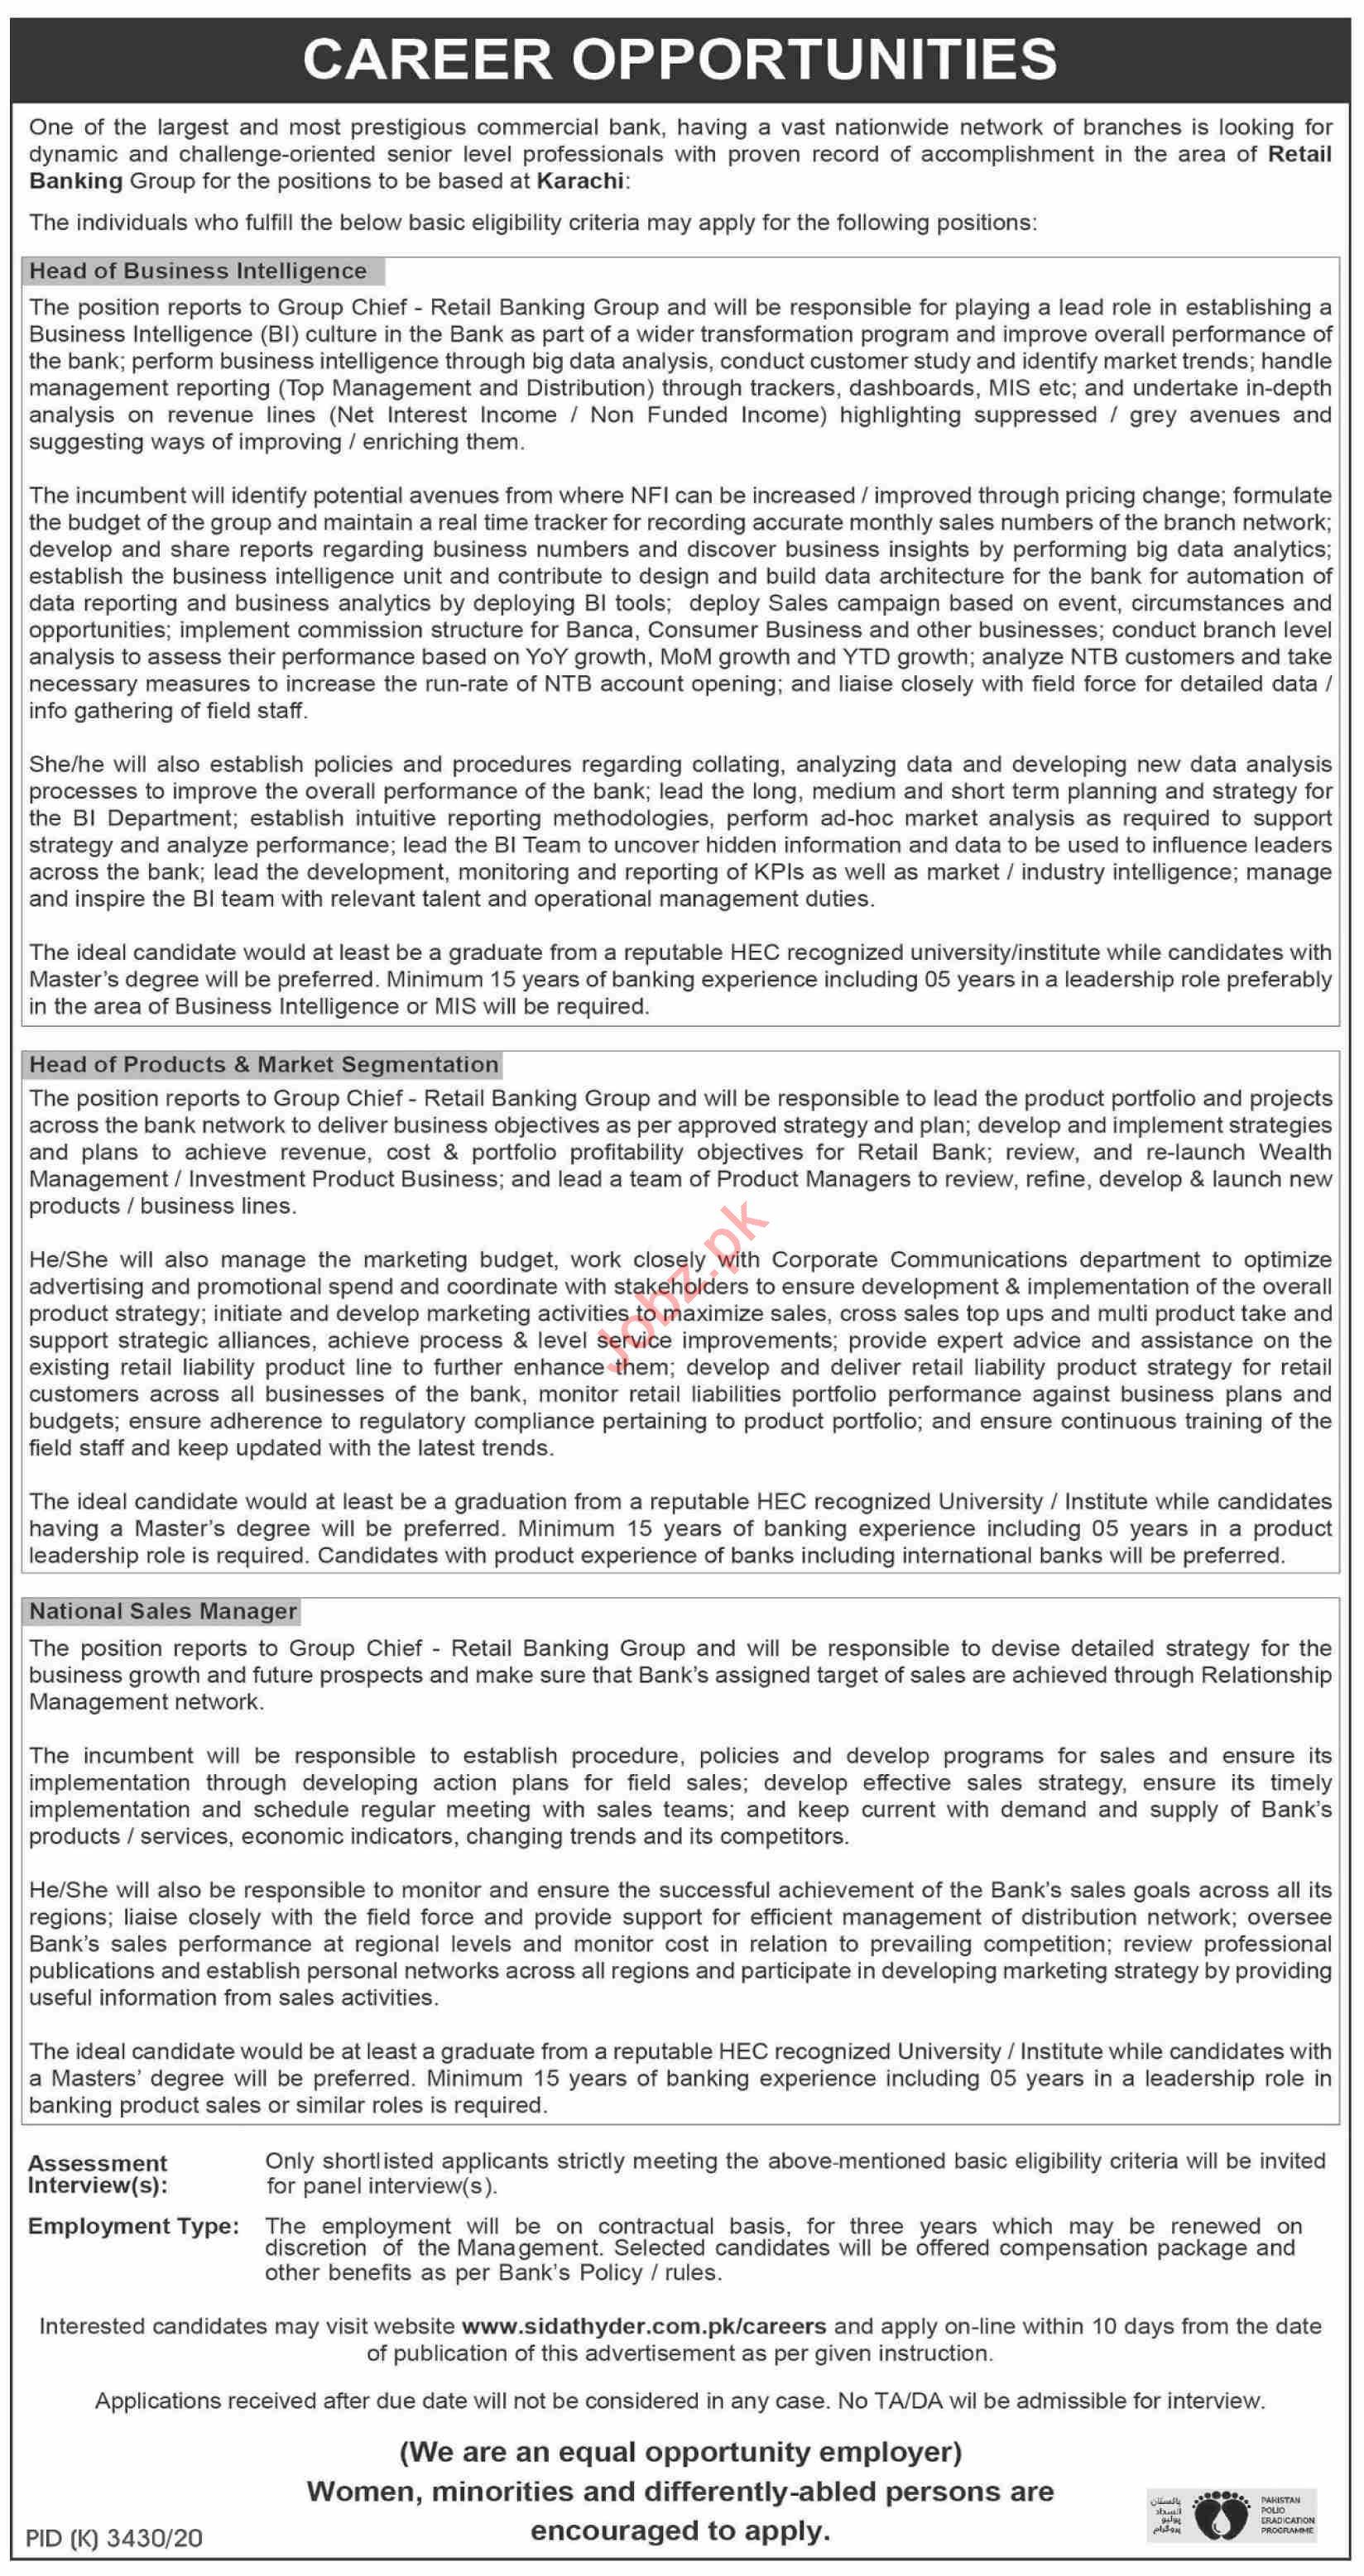 Head of Business Intelligence Jobs 2021 in Karachi